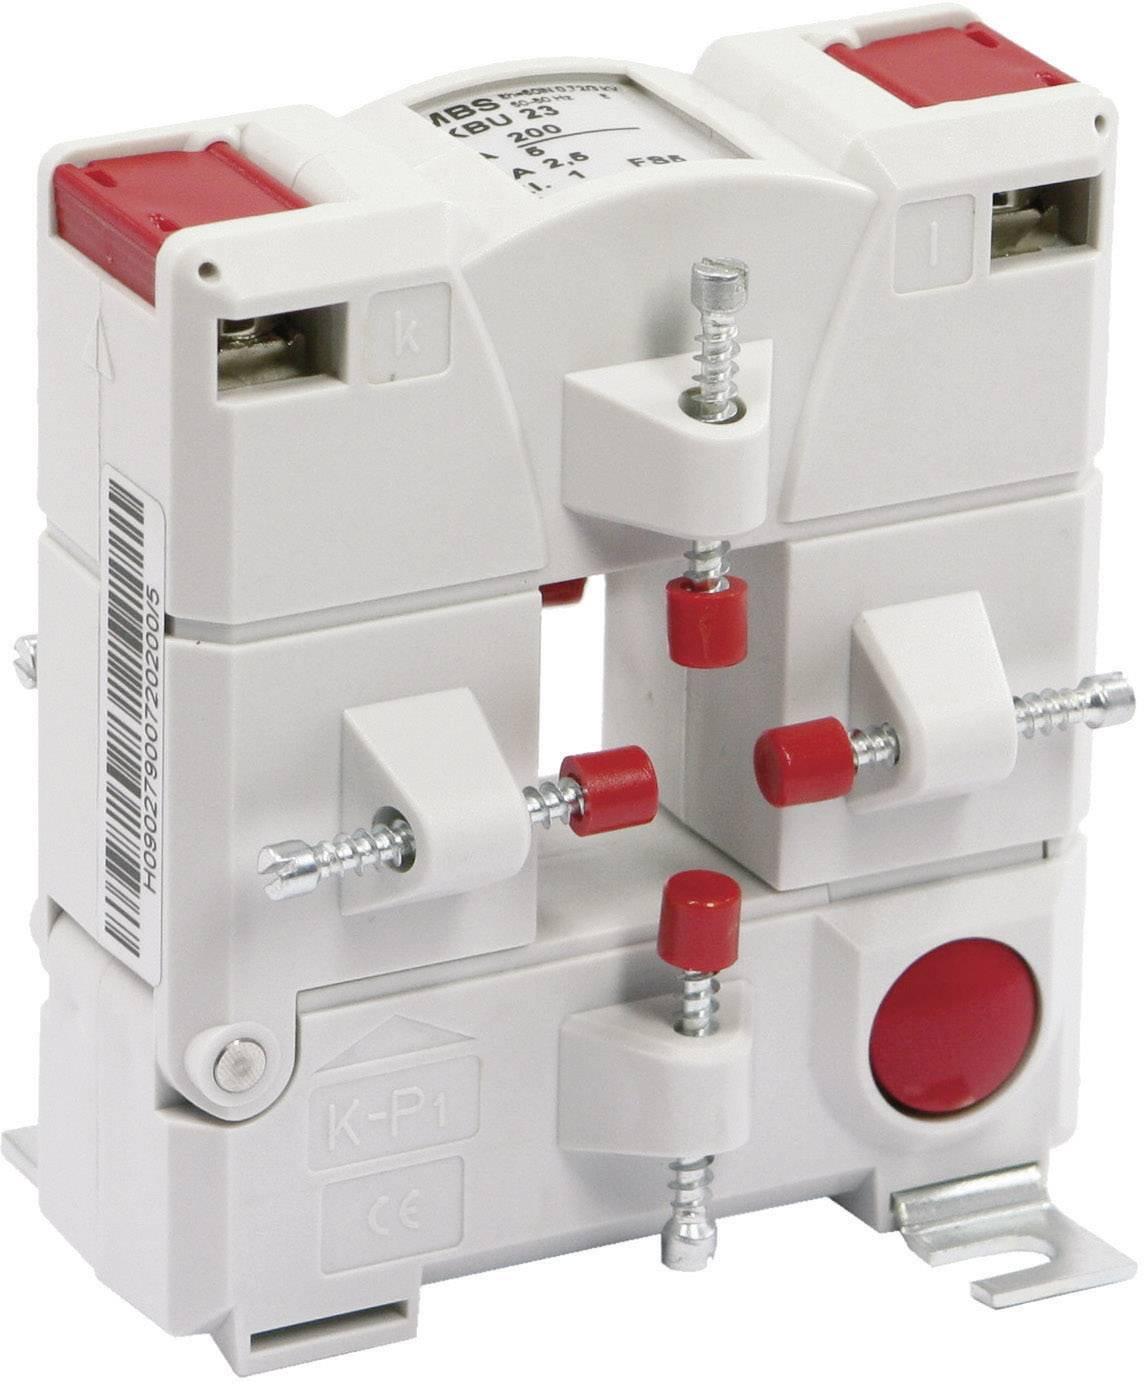 Zásuvný merací transformátor prúdu MBS KBU 23 300/5 A 3,75 VA Kl.1